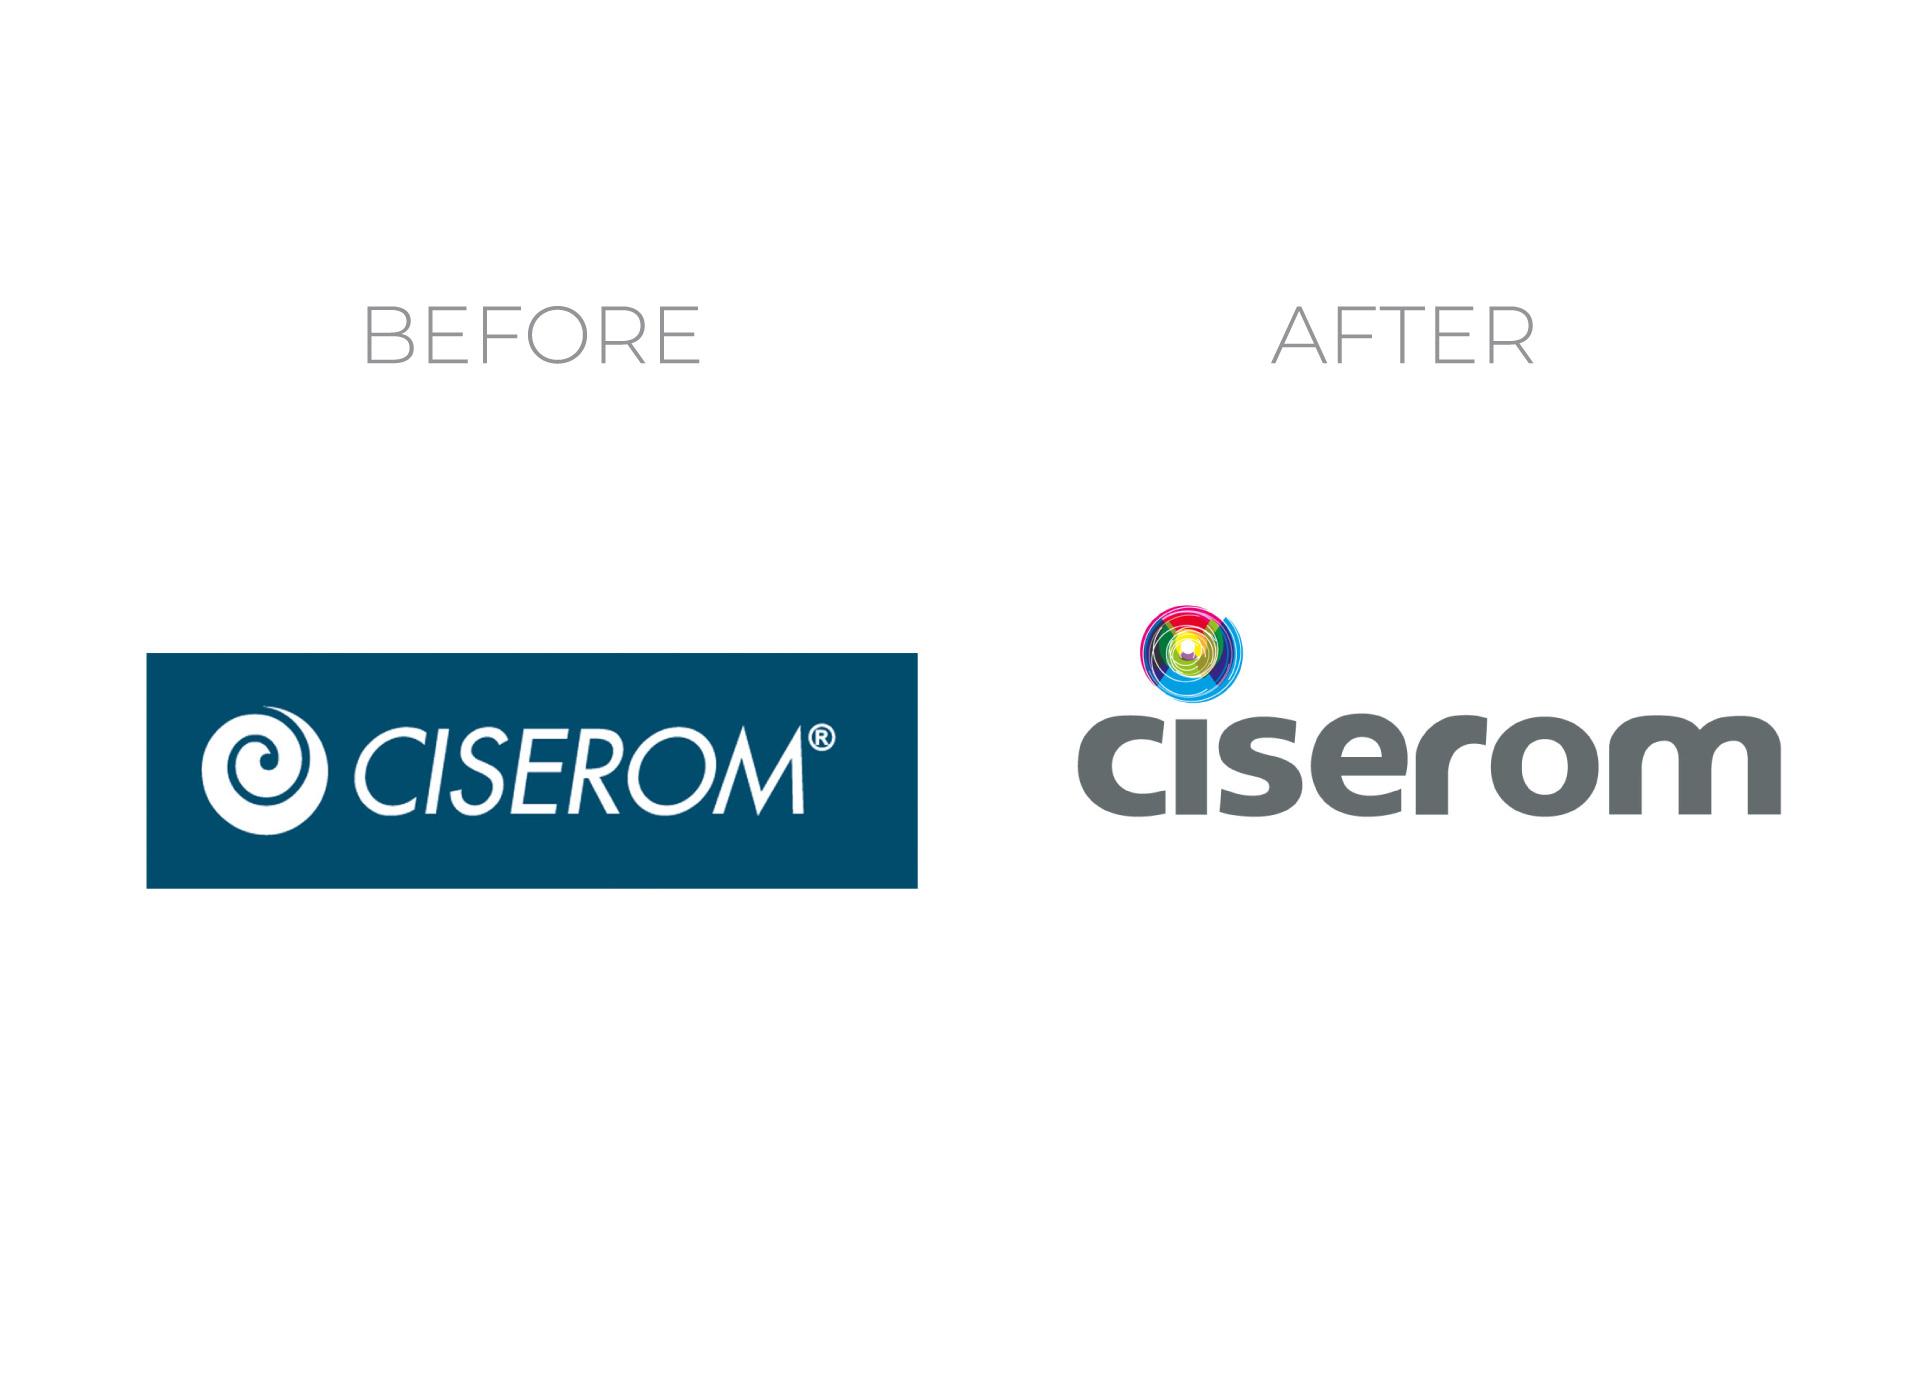 ciserom portfolio inoveo before and after rebranding